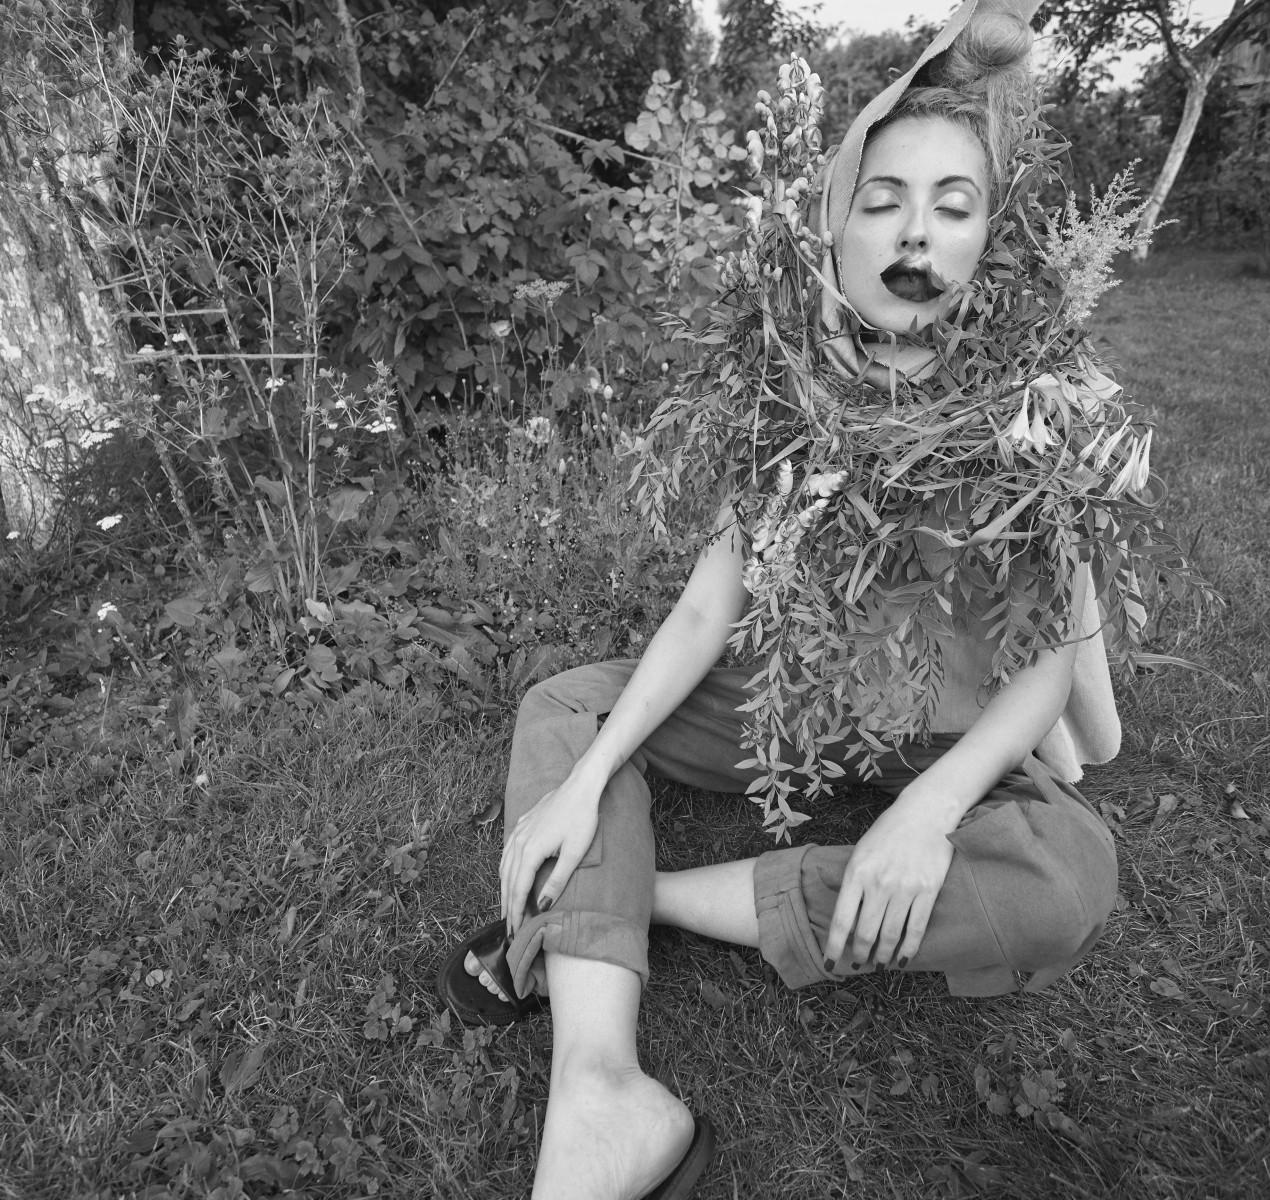 photo Vladimir Lyovin, stylist Evgenia Lyovina, designer Dasha Babaeva, floral design Elena Laydinen, model Sasha Vahomskaya, August 2015, Saint Petersburg